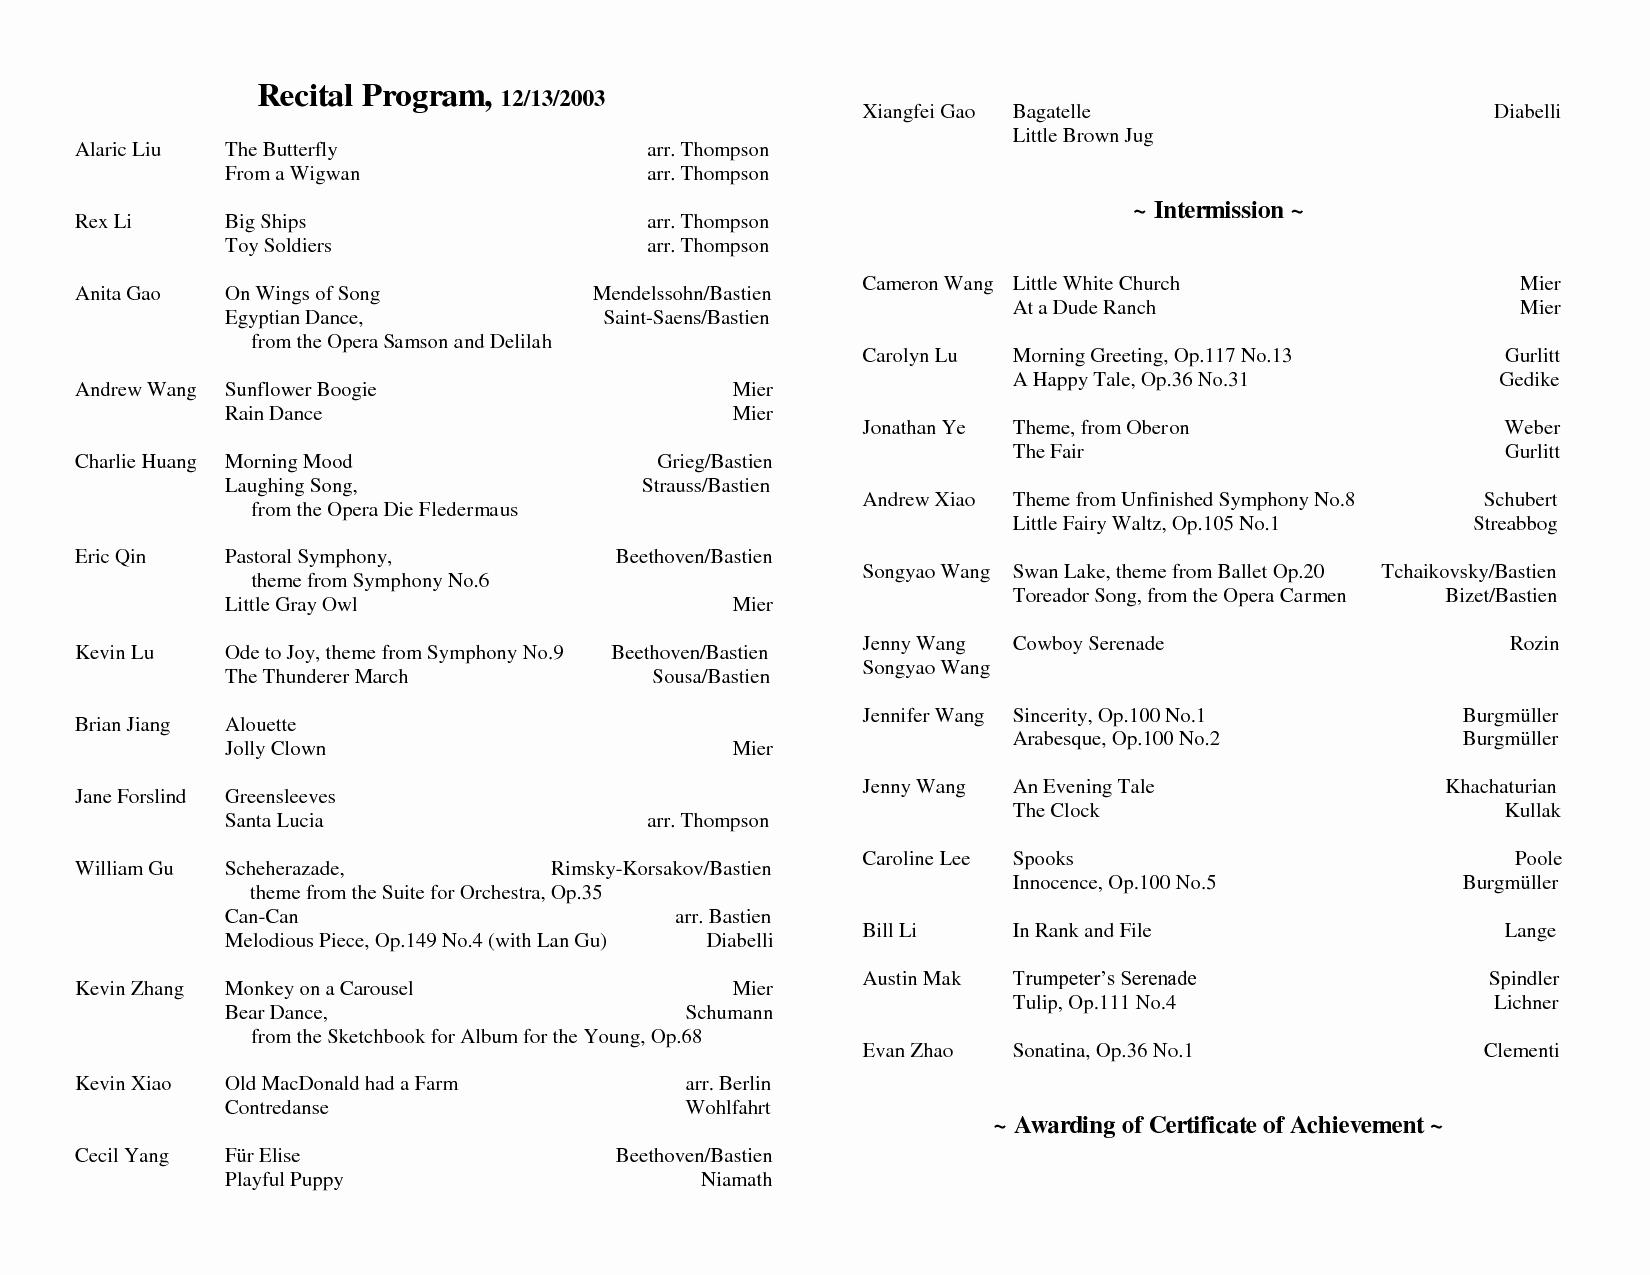 Piano Recital Program Template Free Luxury 5 Best Of Christmas Piano Recital Program Template